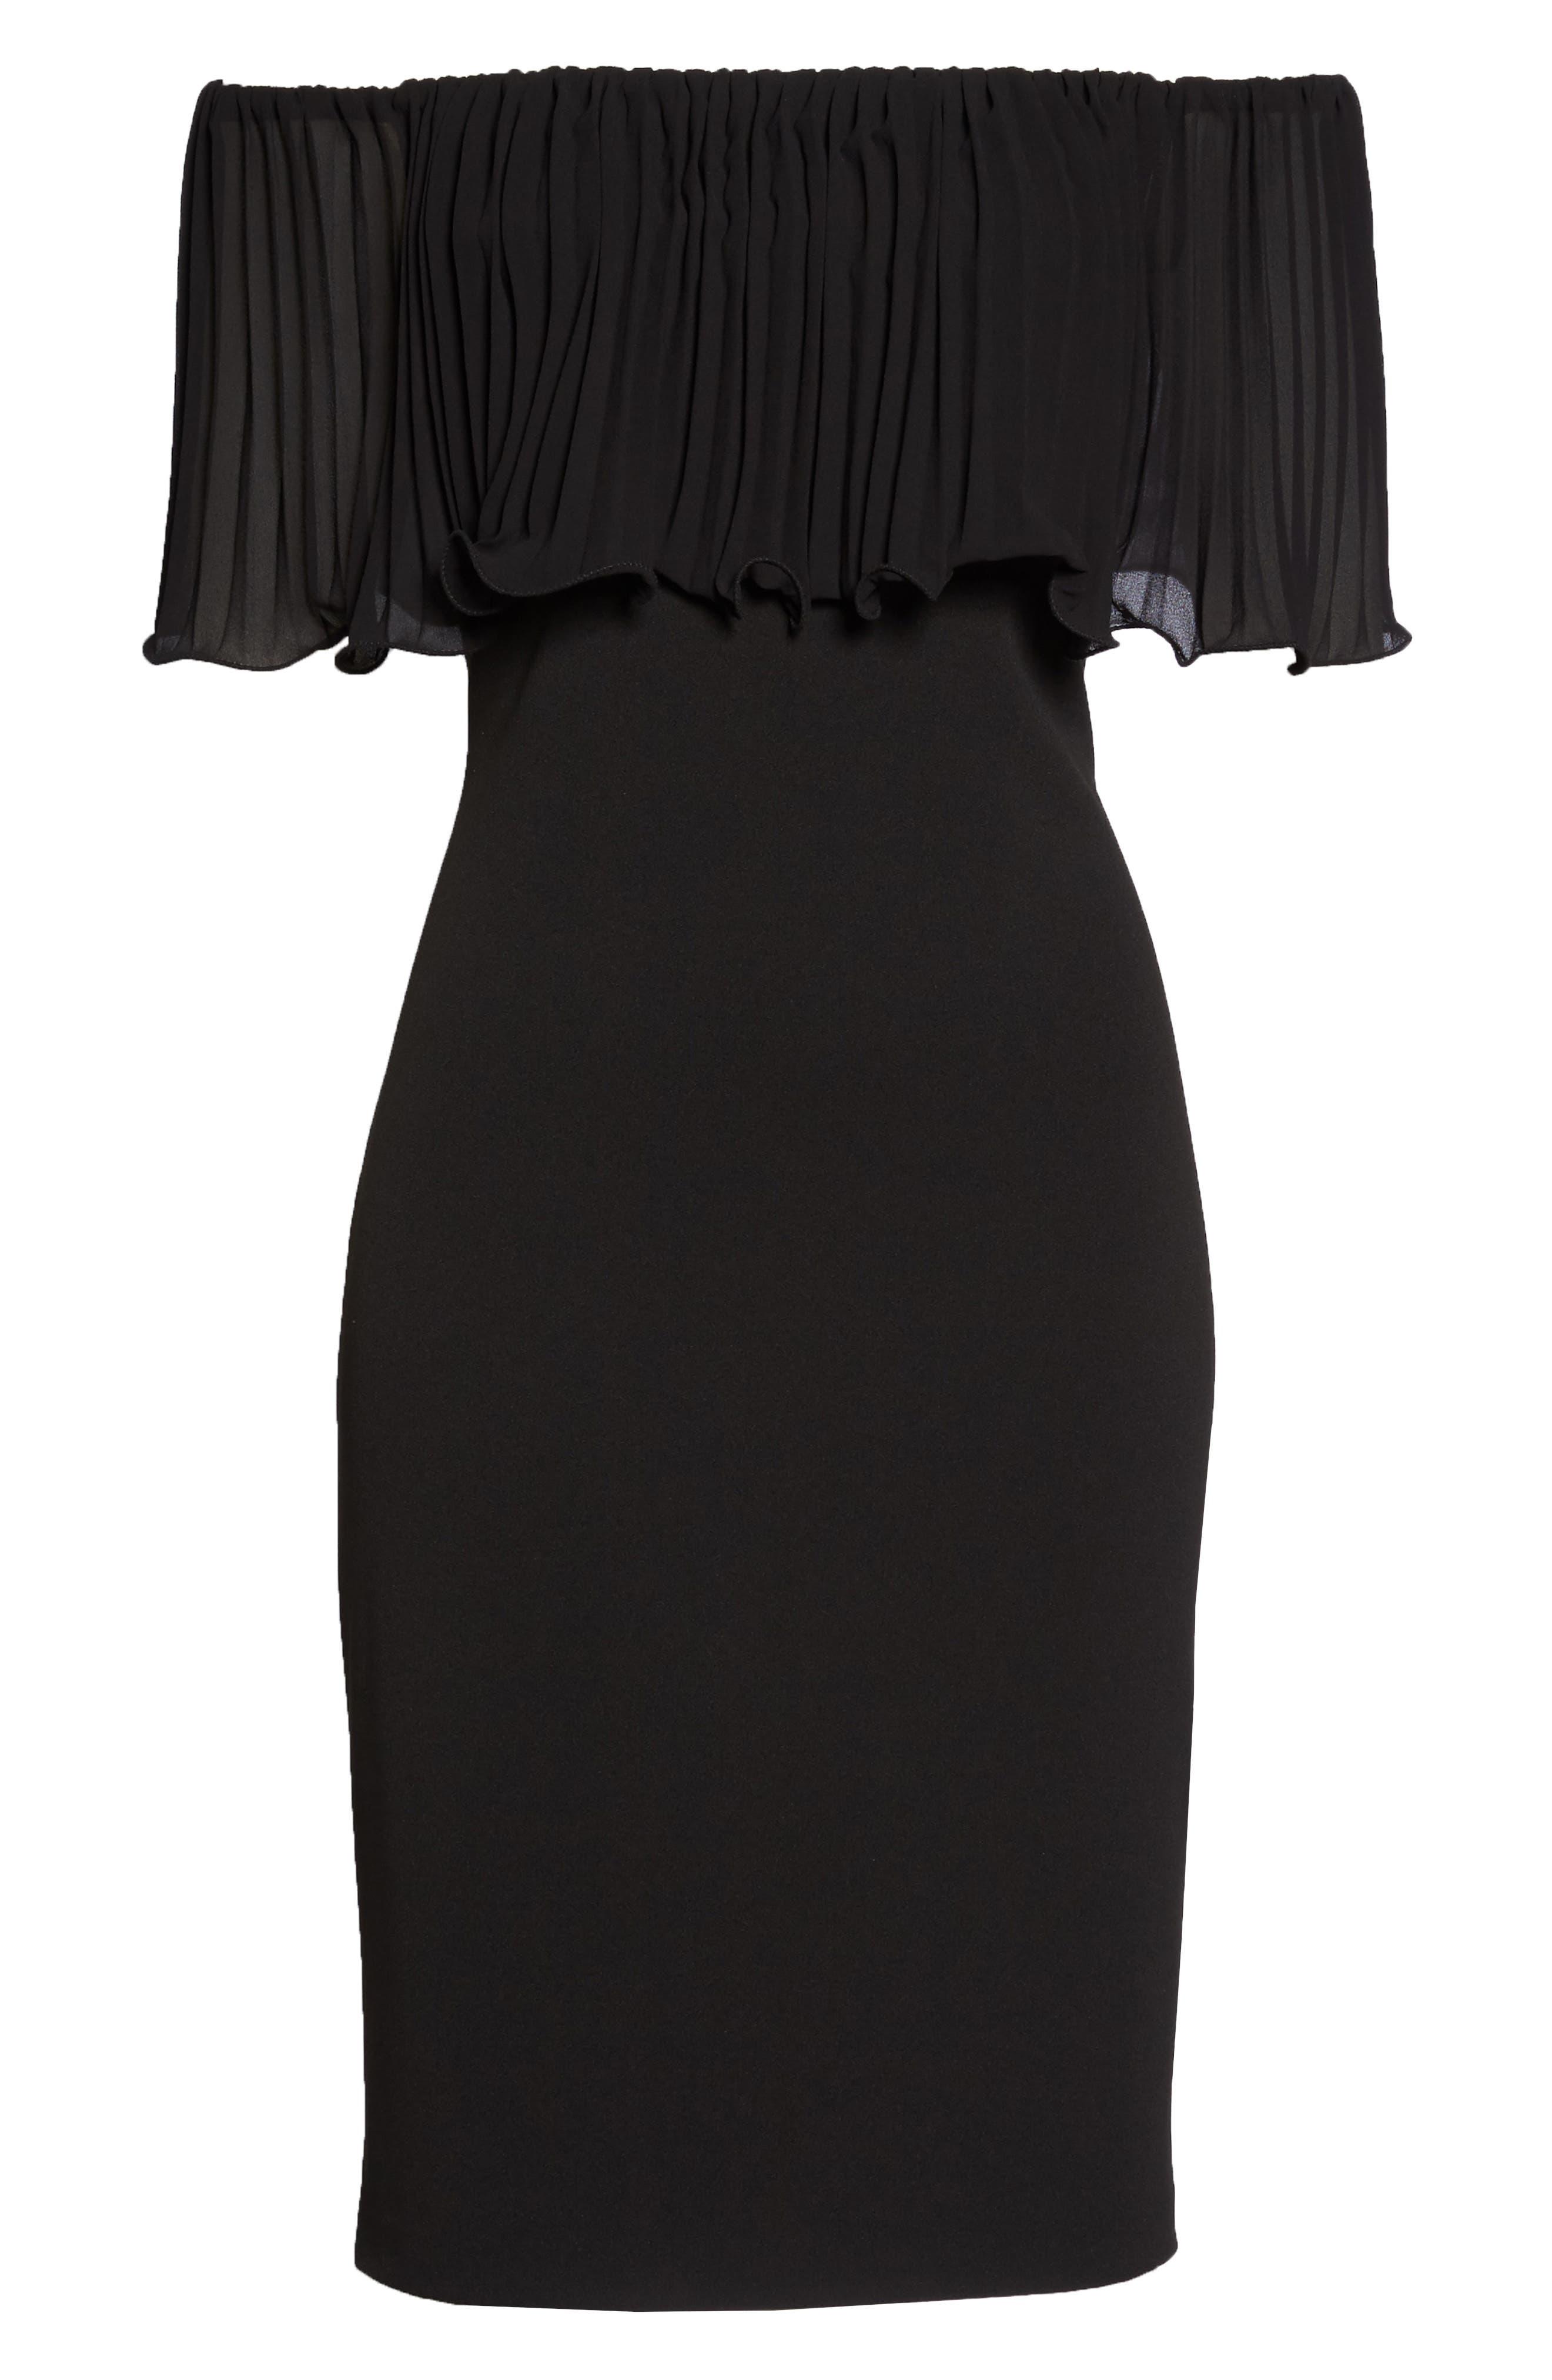 Pleat Ruffle Off the Shoulder Dress,                             Alternate thumbnail 6, color,                             Black